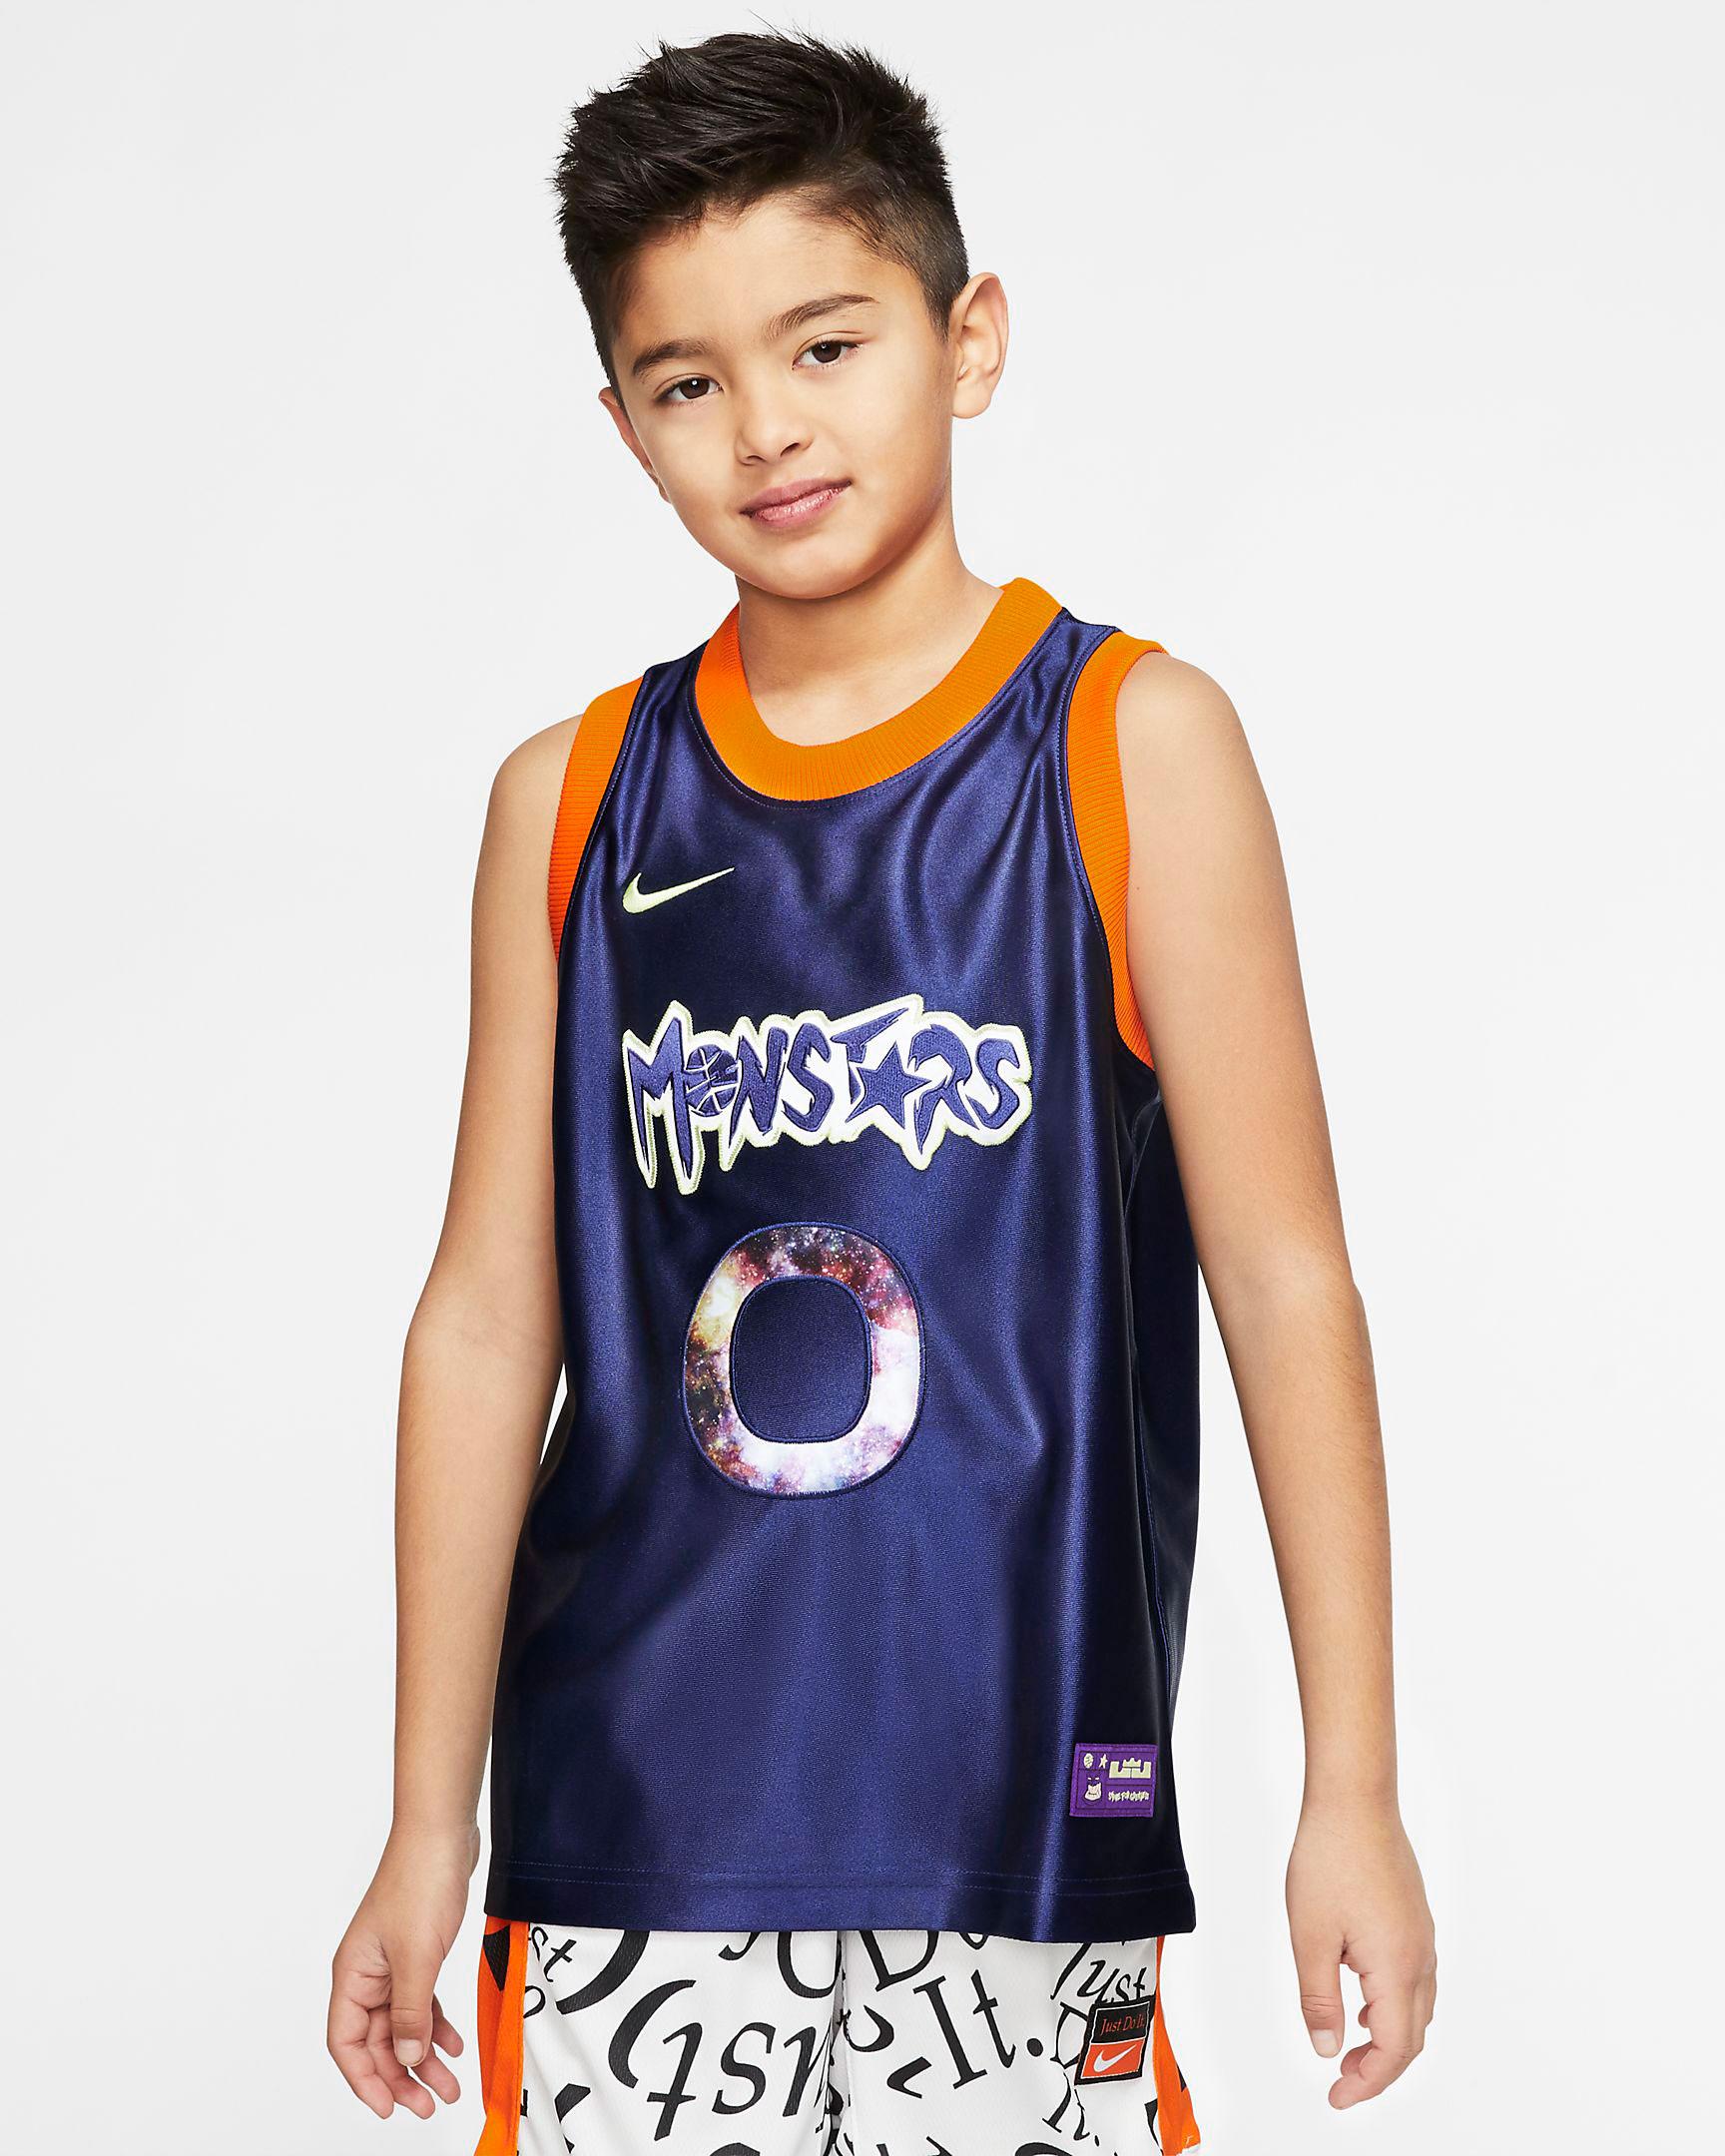 nike-lebron-monstars-kids-jersey-1